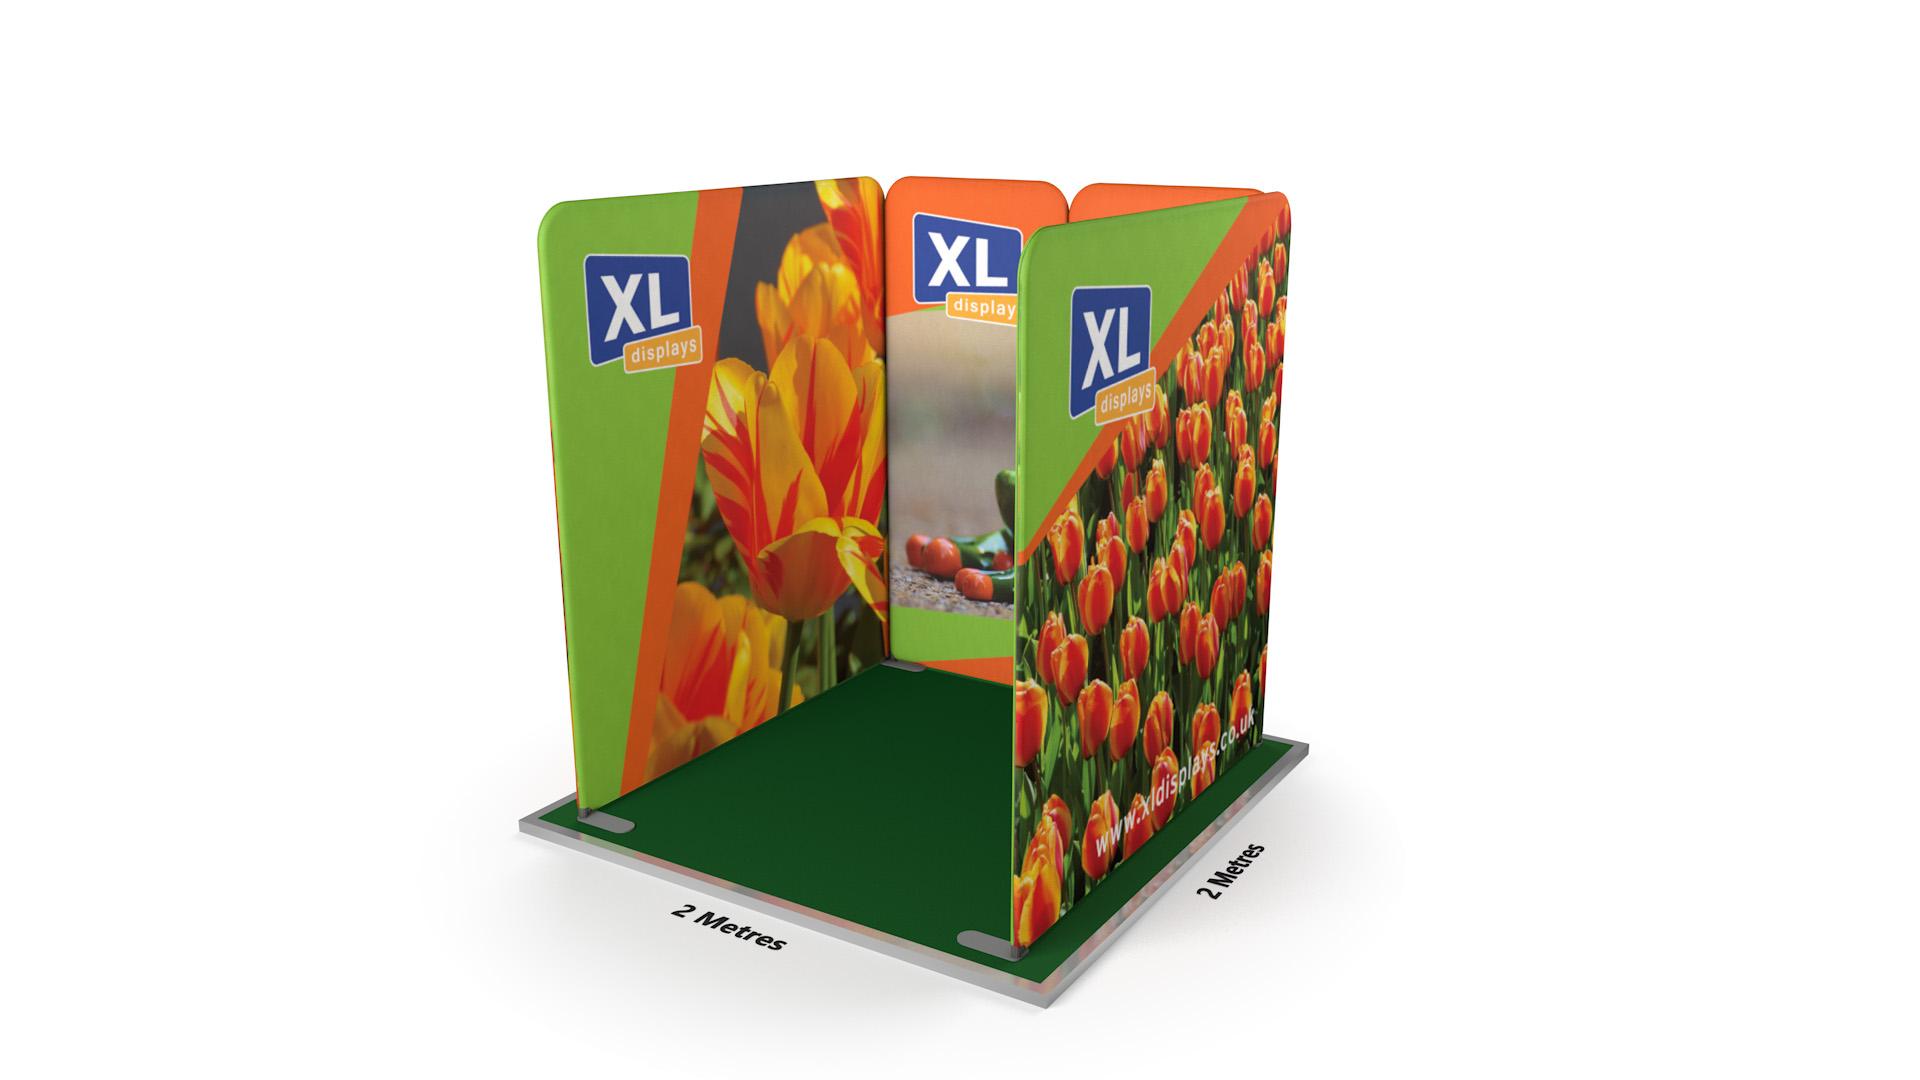 Fabric Exhibition Stand : Modulate™ displays u shaped fabric exhibition stands